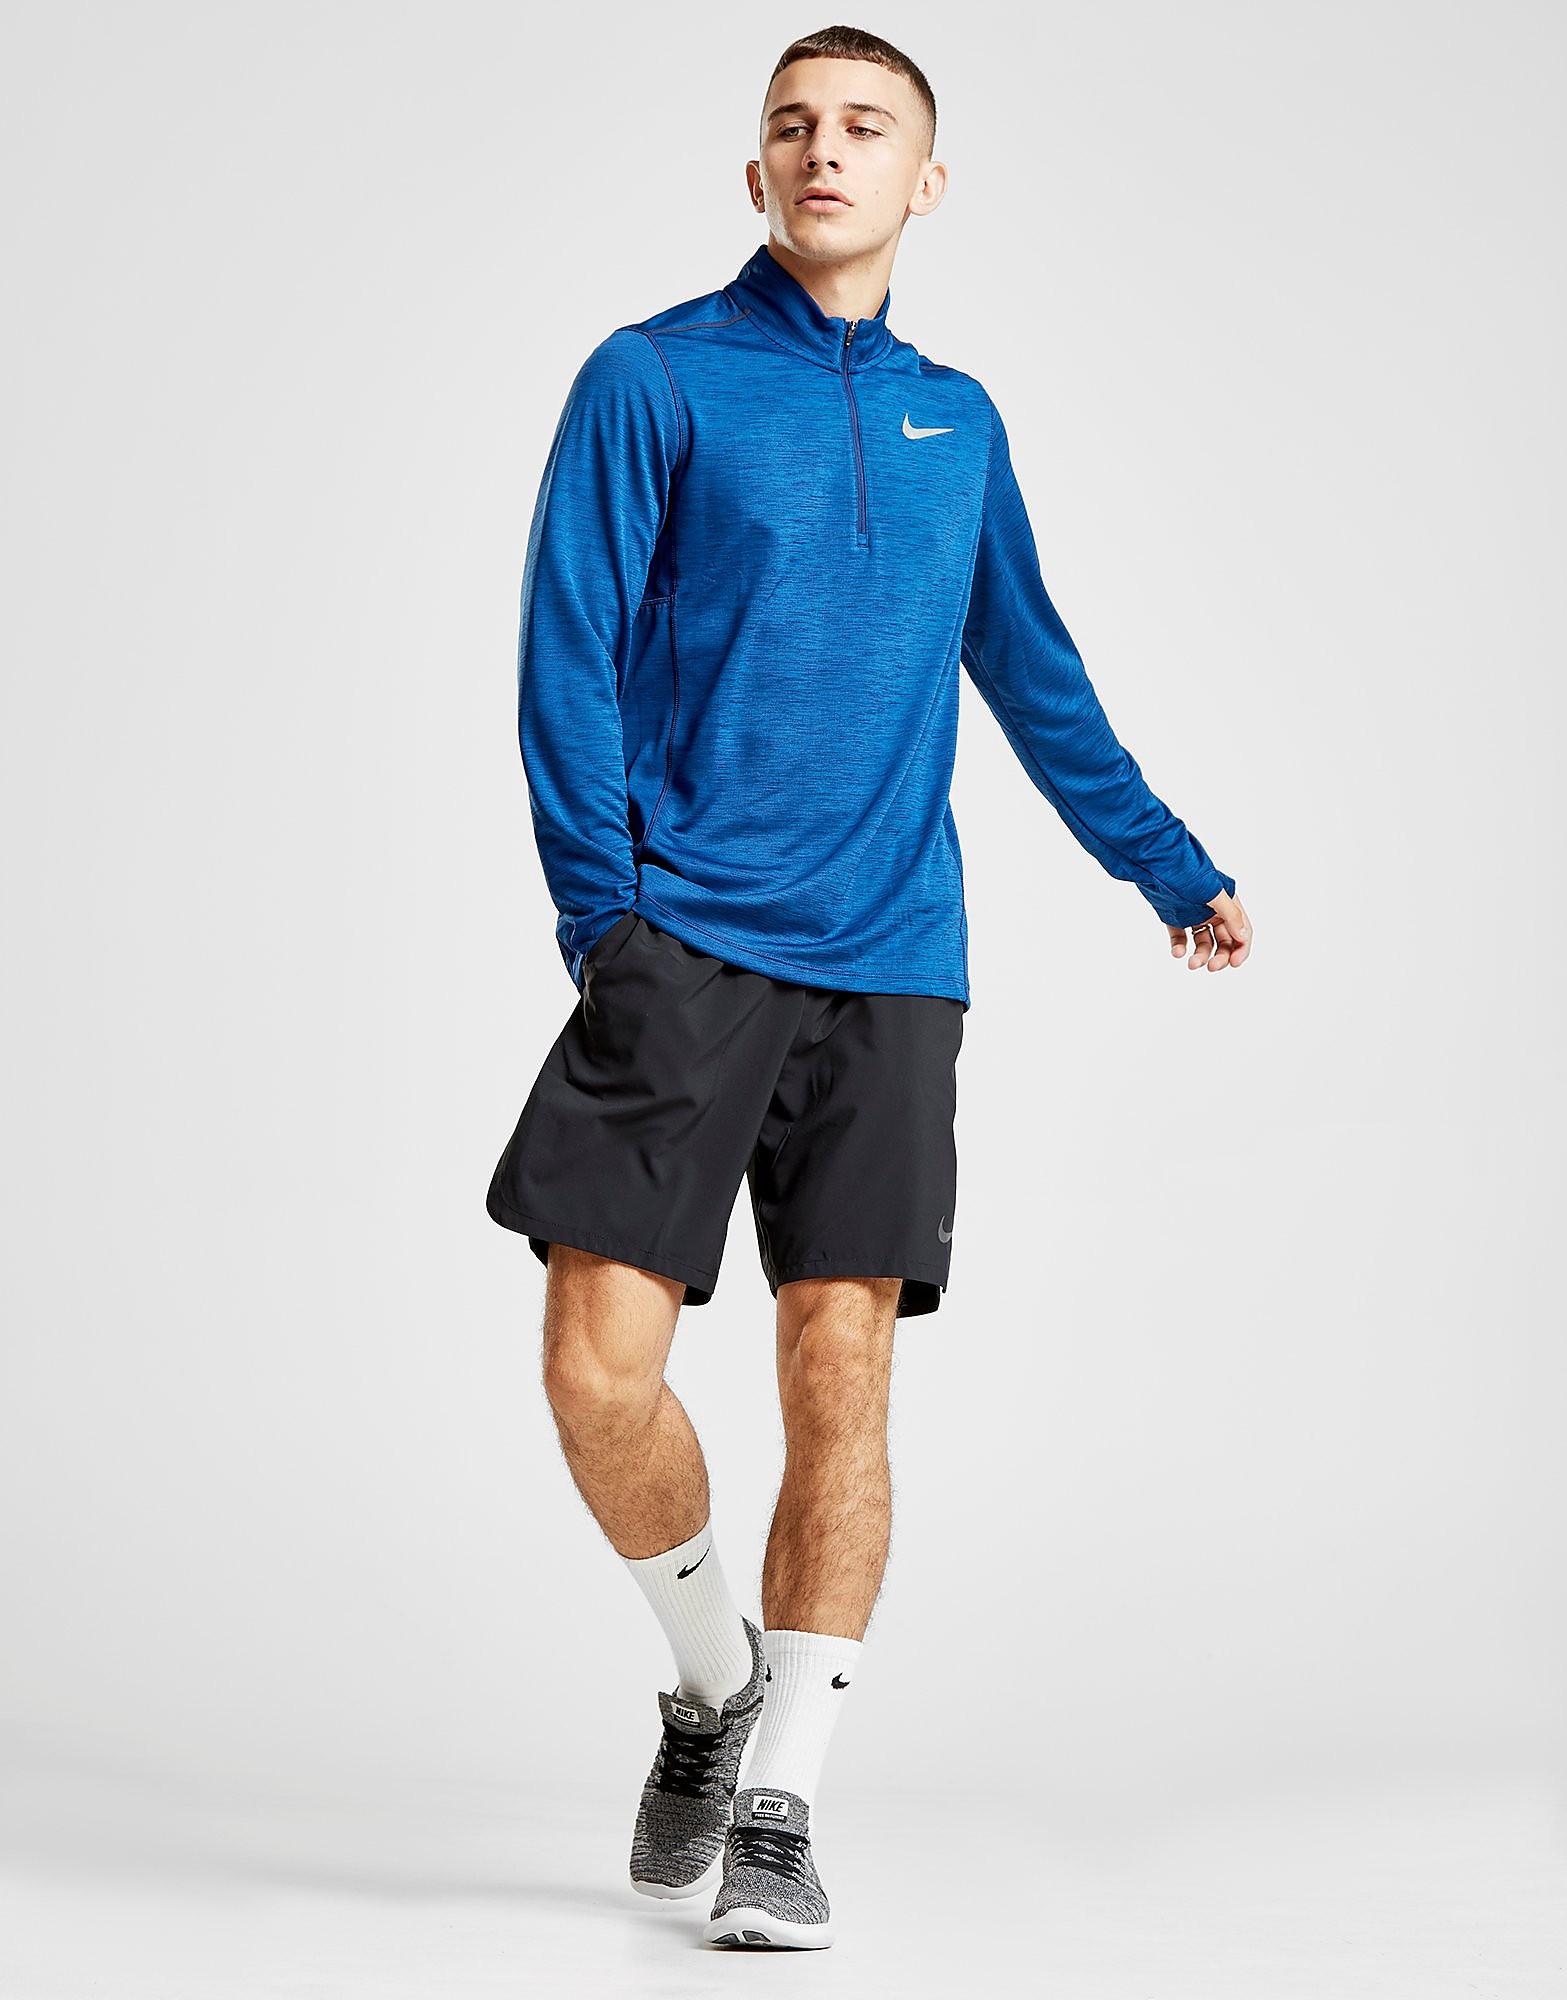 Nike Flex Vented Shorts